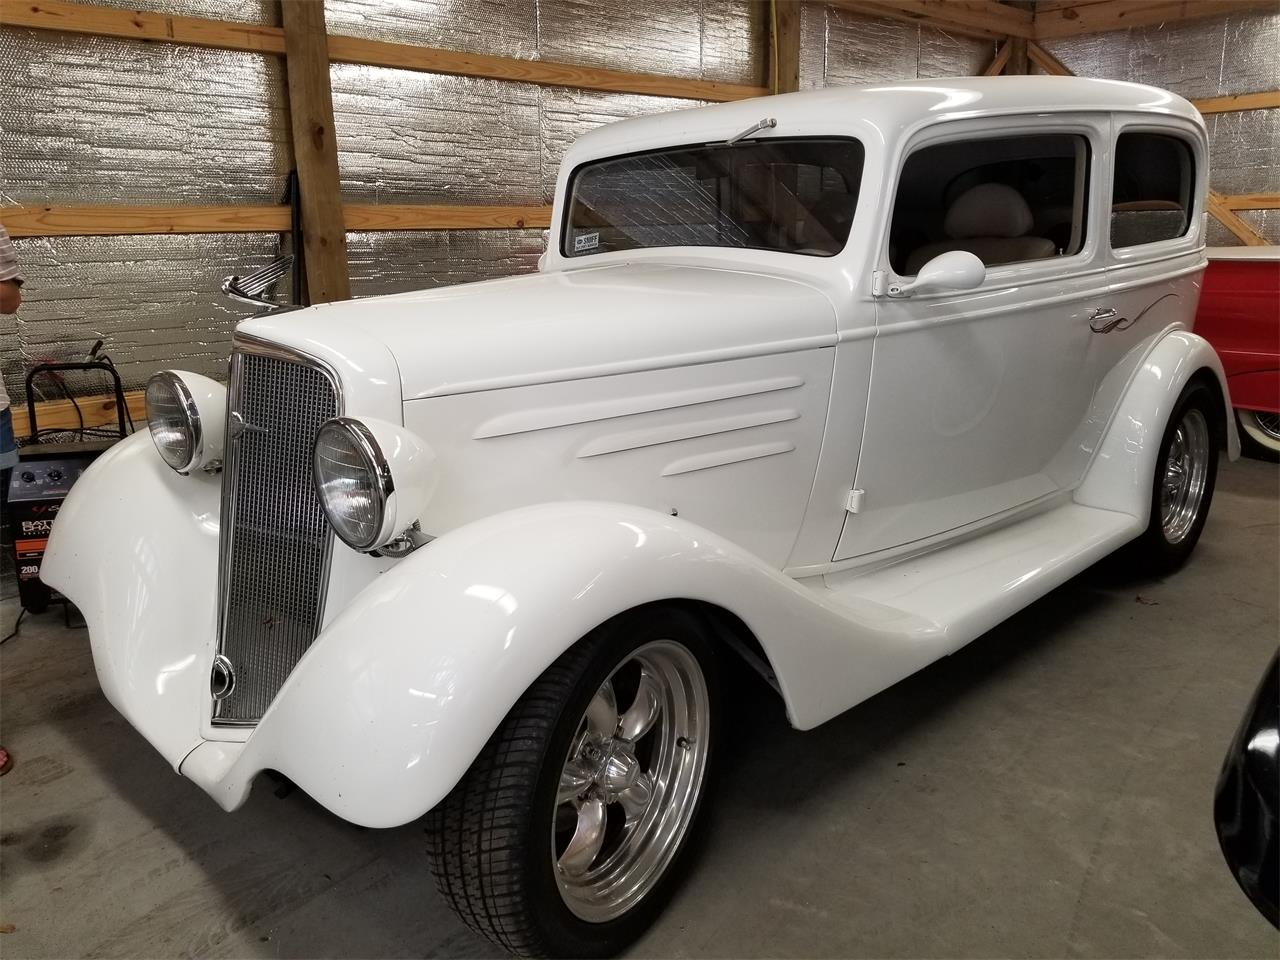 Large Picture of 1935 Chevrolet Sedan - $51,300.00 - QKKC